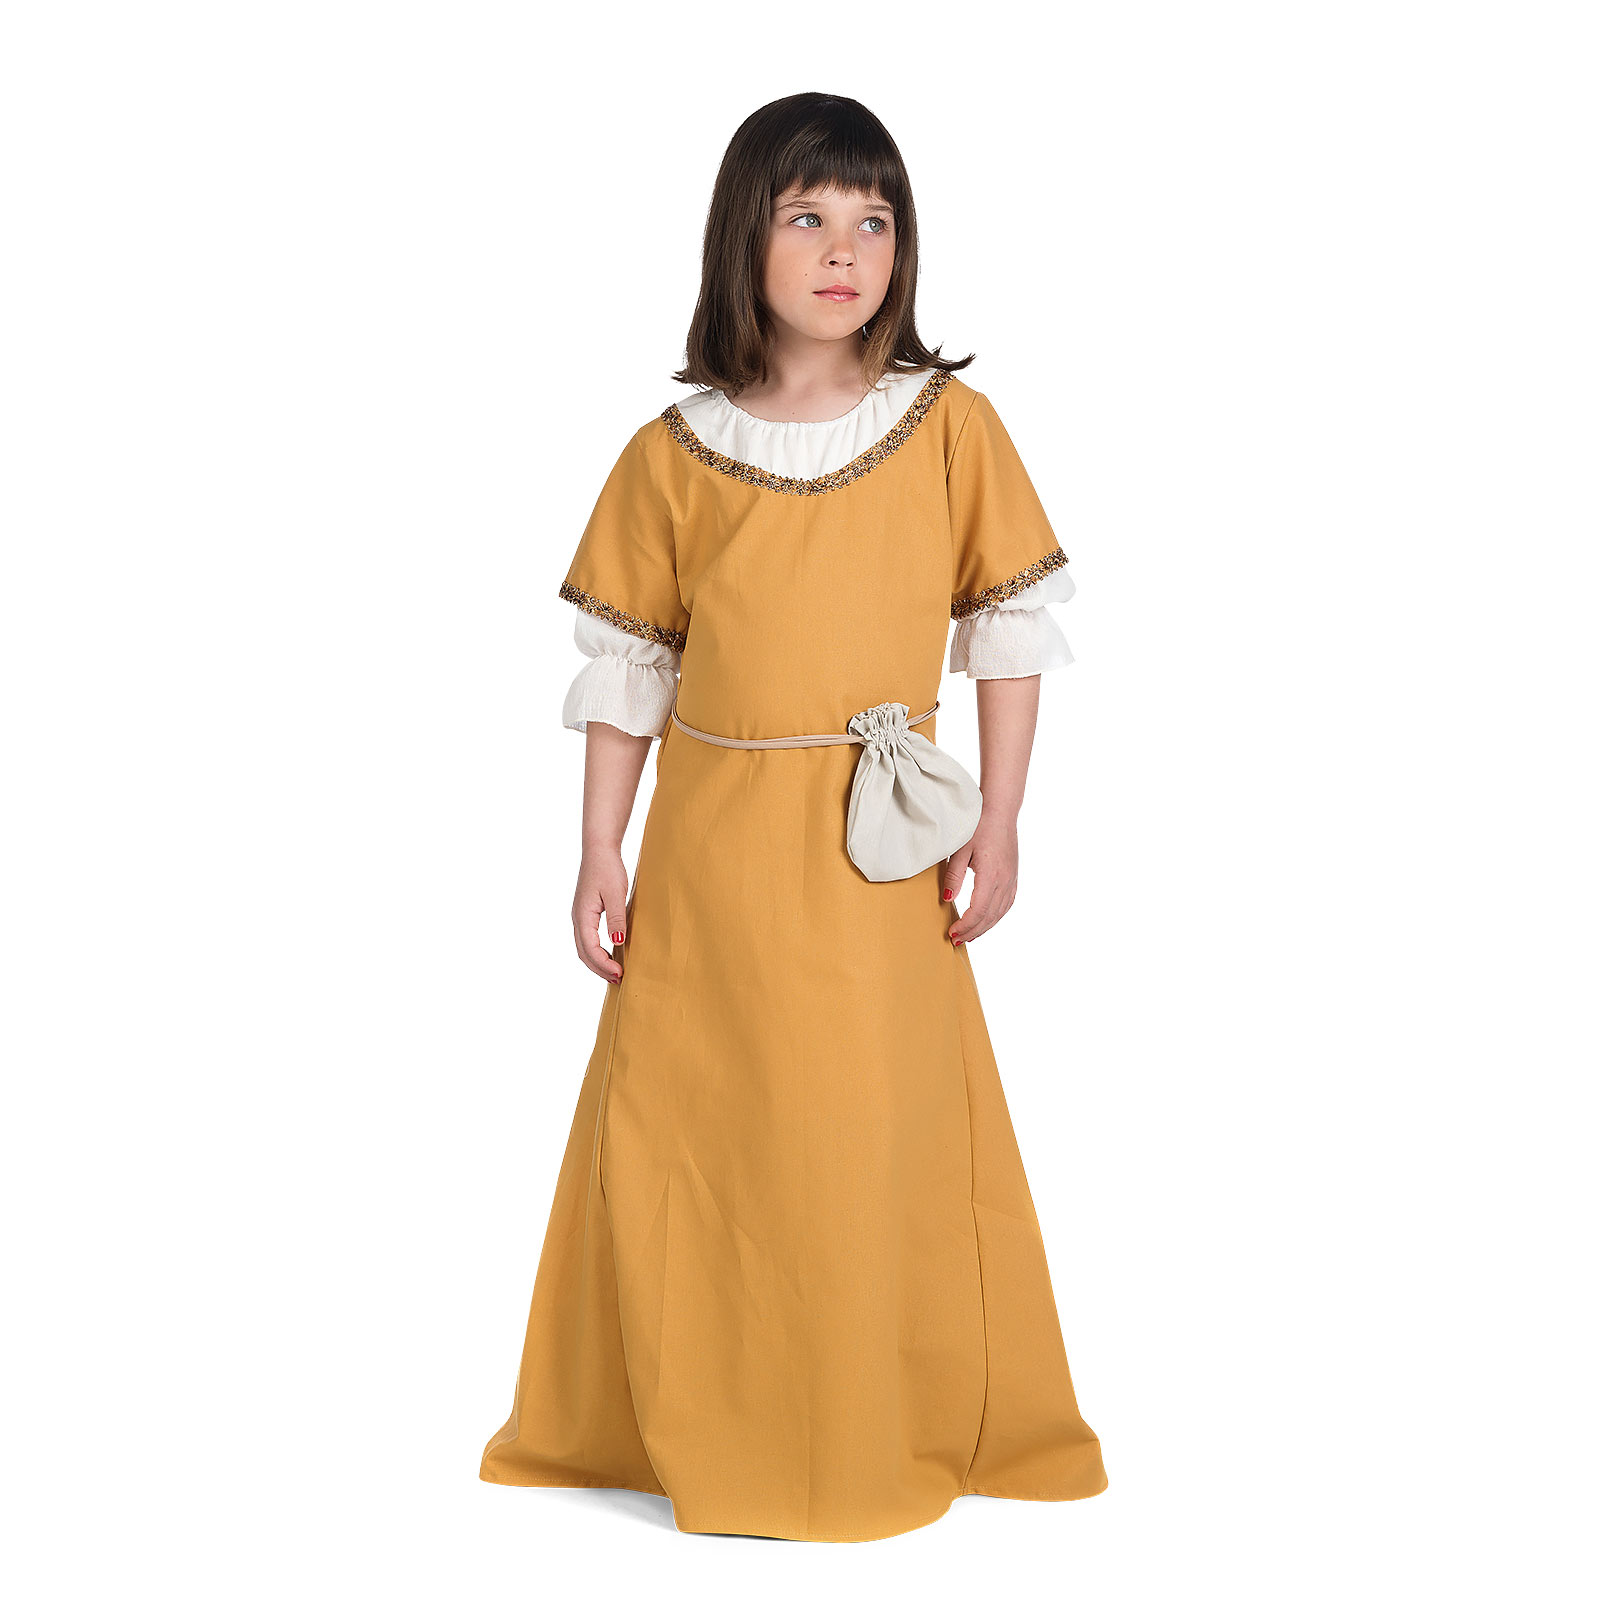 Sommer Maid Mittelalter Kostüm Kinder